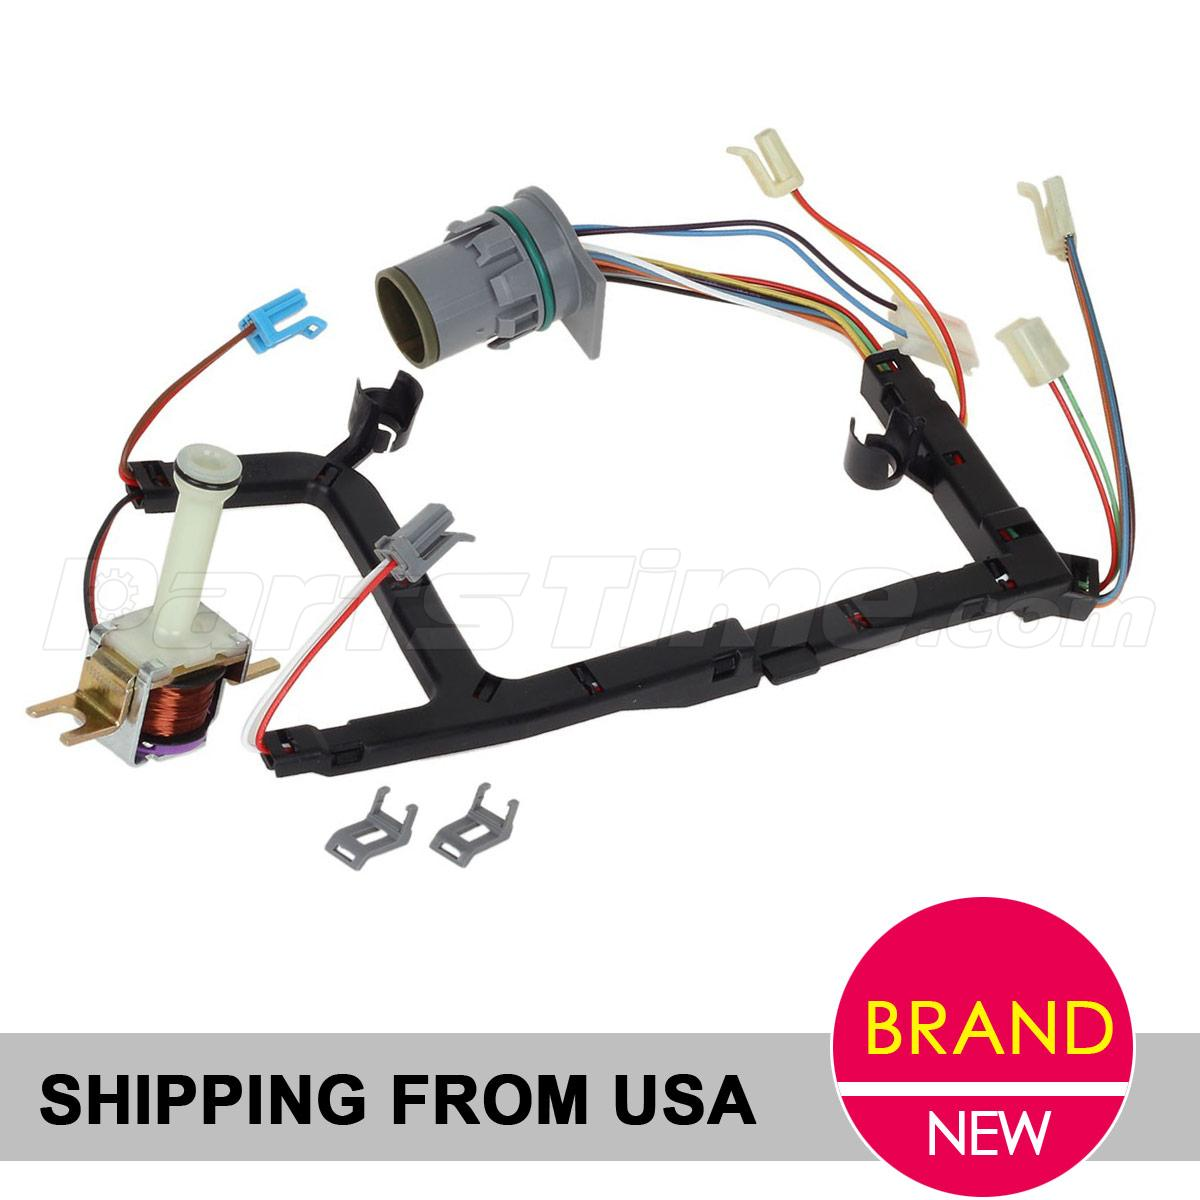 jeep transmission wiring 4l60e transmission internal wire harness with tcc lock up ... 2002 jeep transmission wiring harness